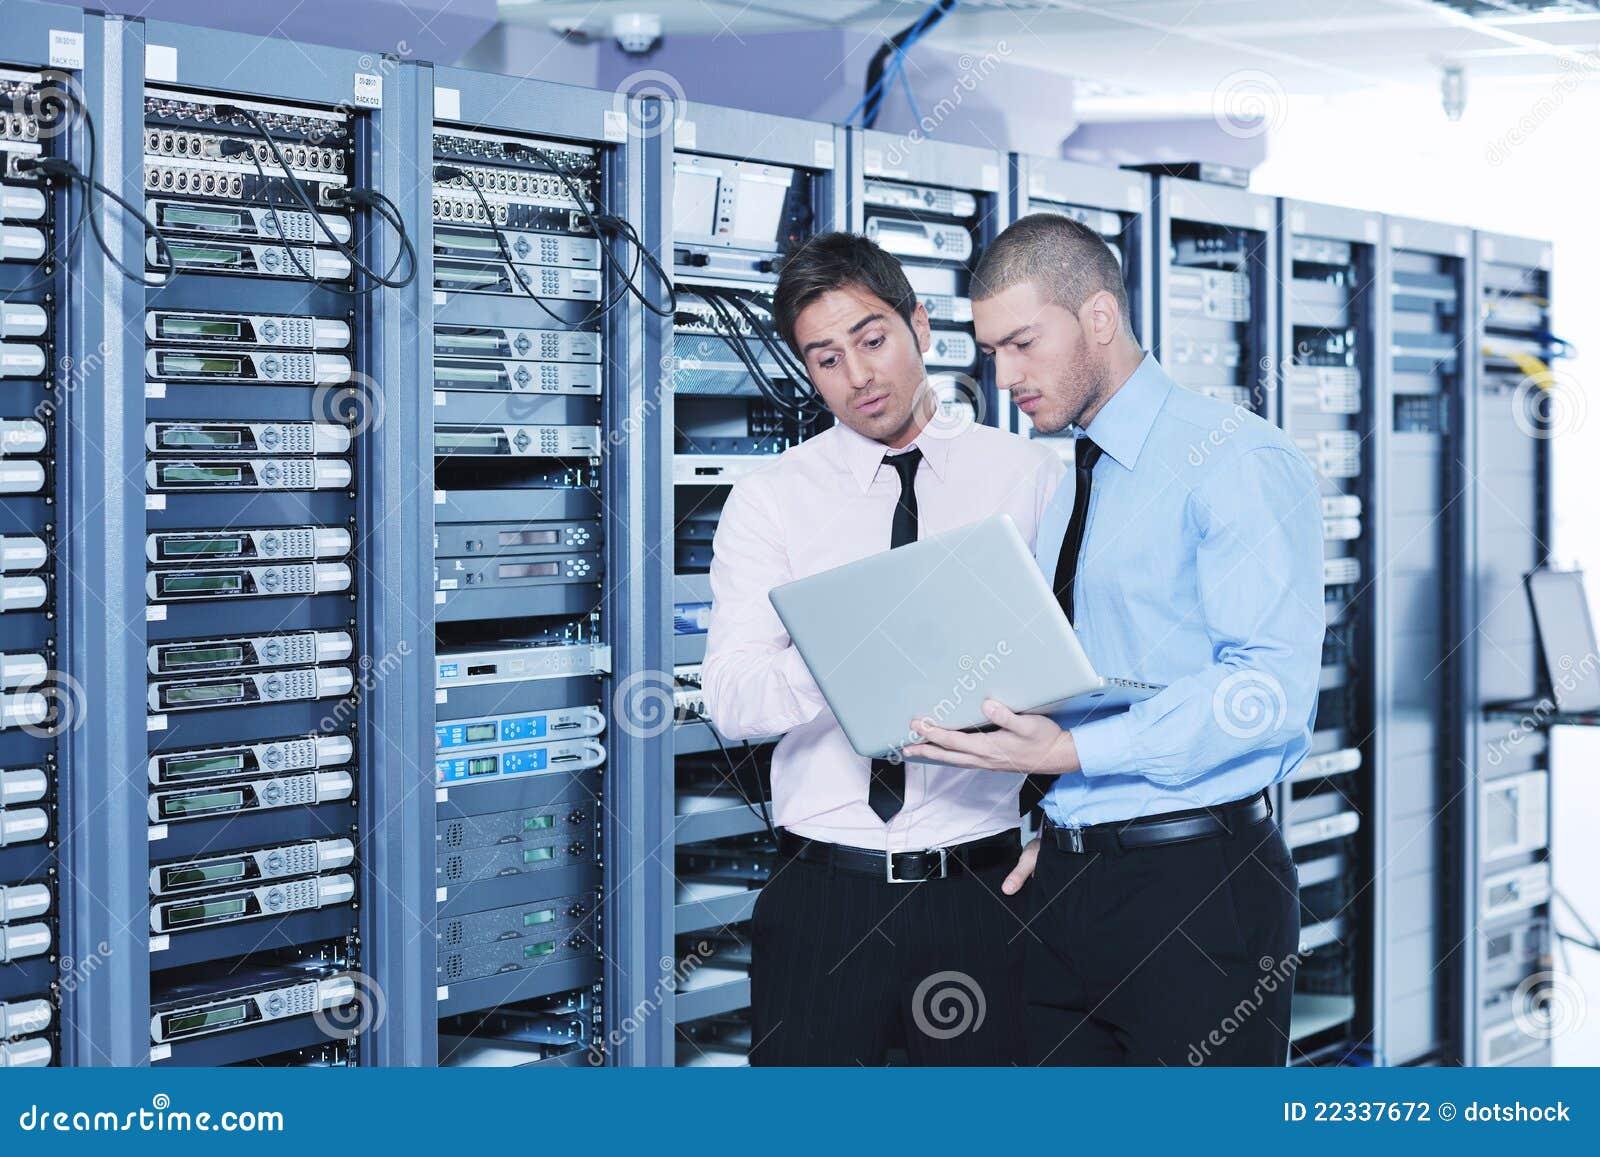 It Room: It Enineers In Network Server Room Stock Photo